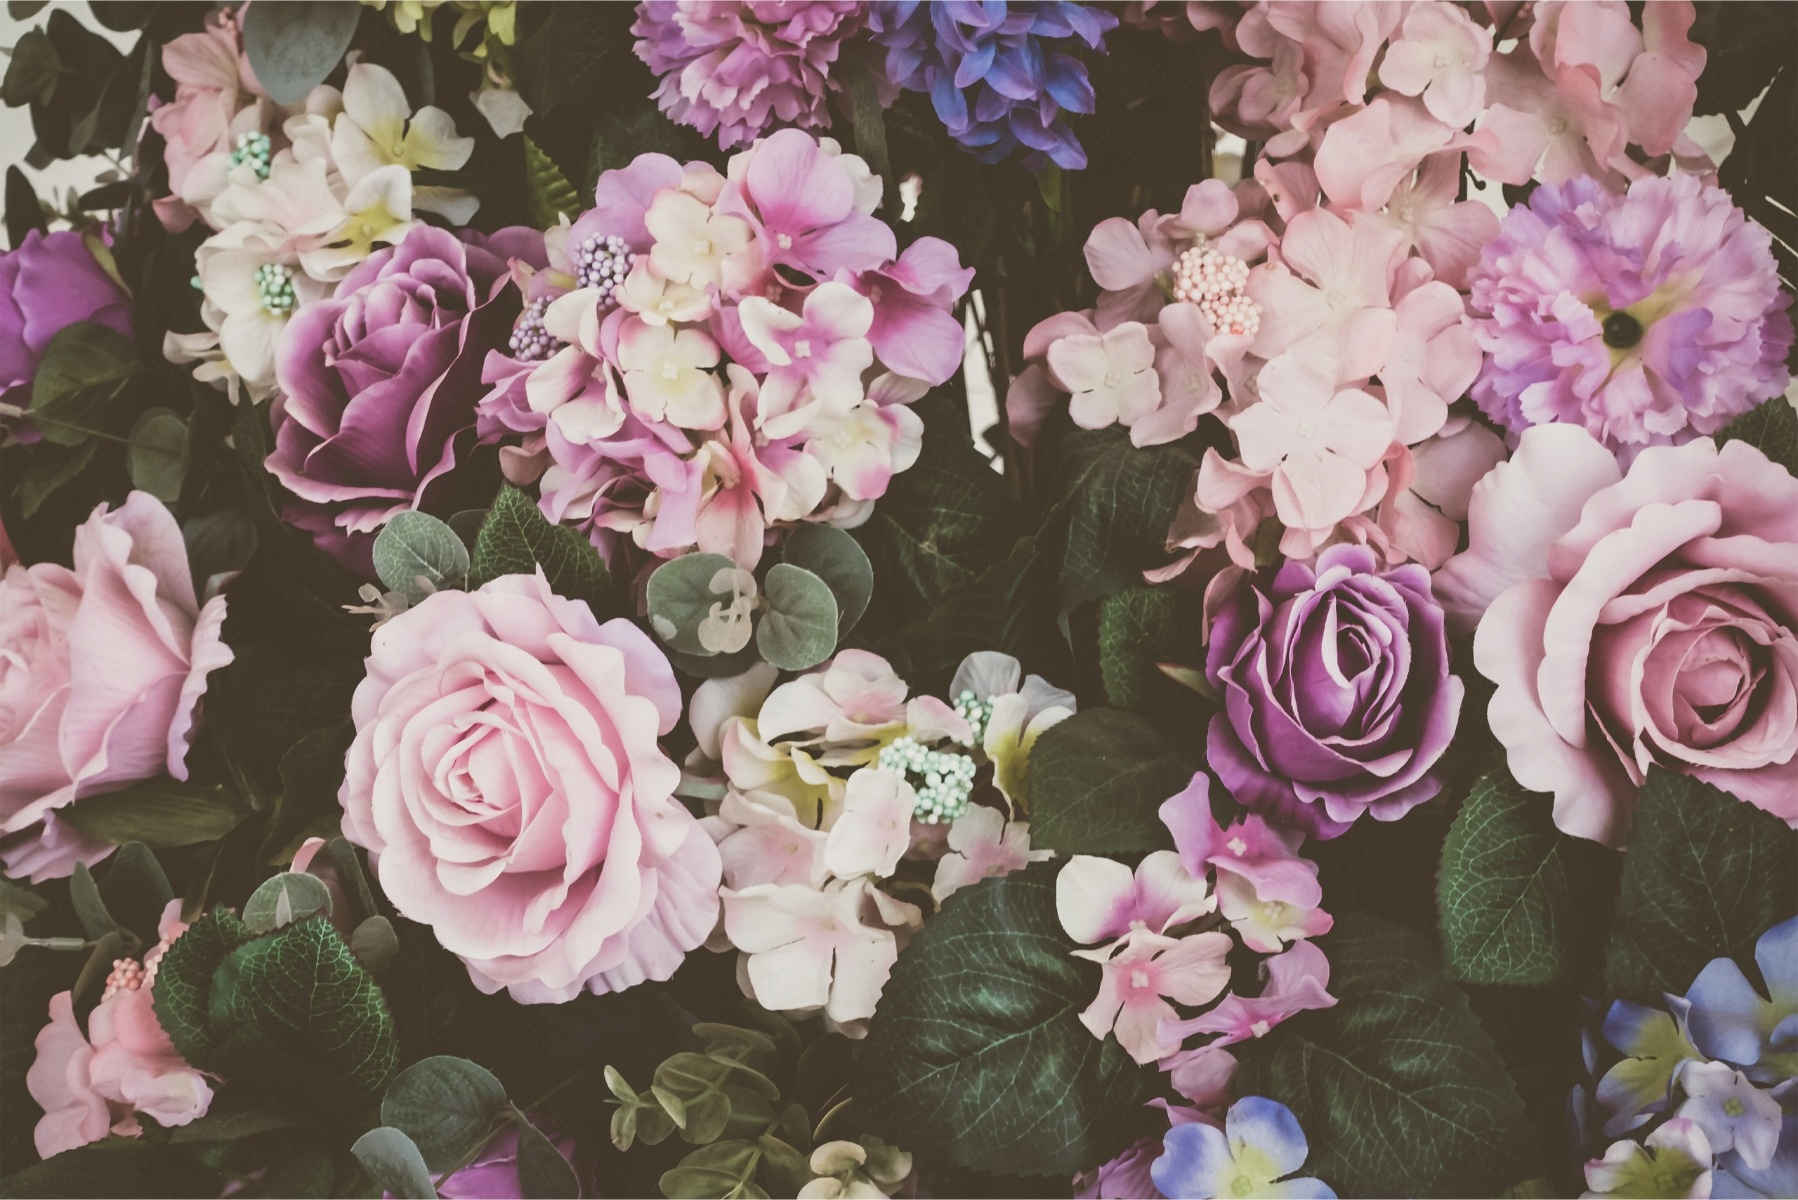 Fototapeta do kuchyne s farebnými kvetmi 3D 135x90